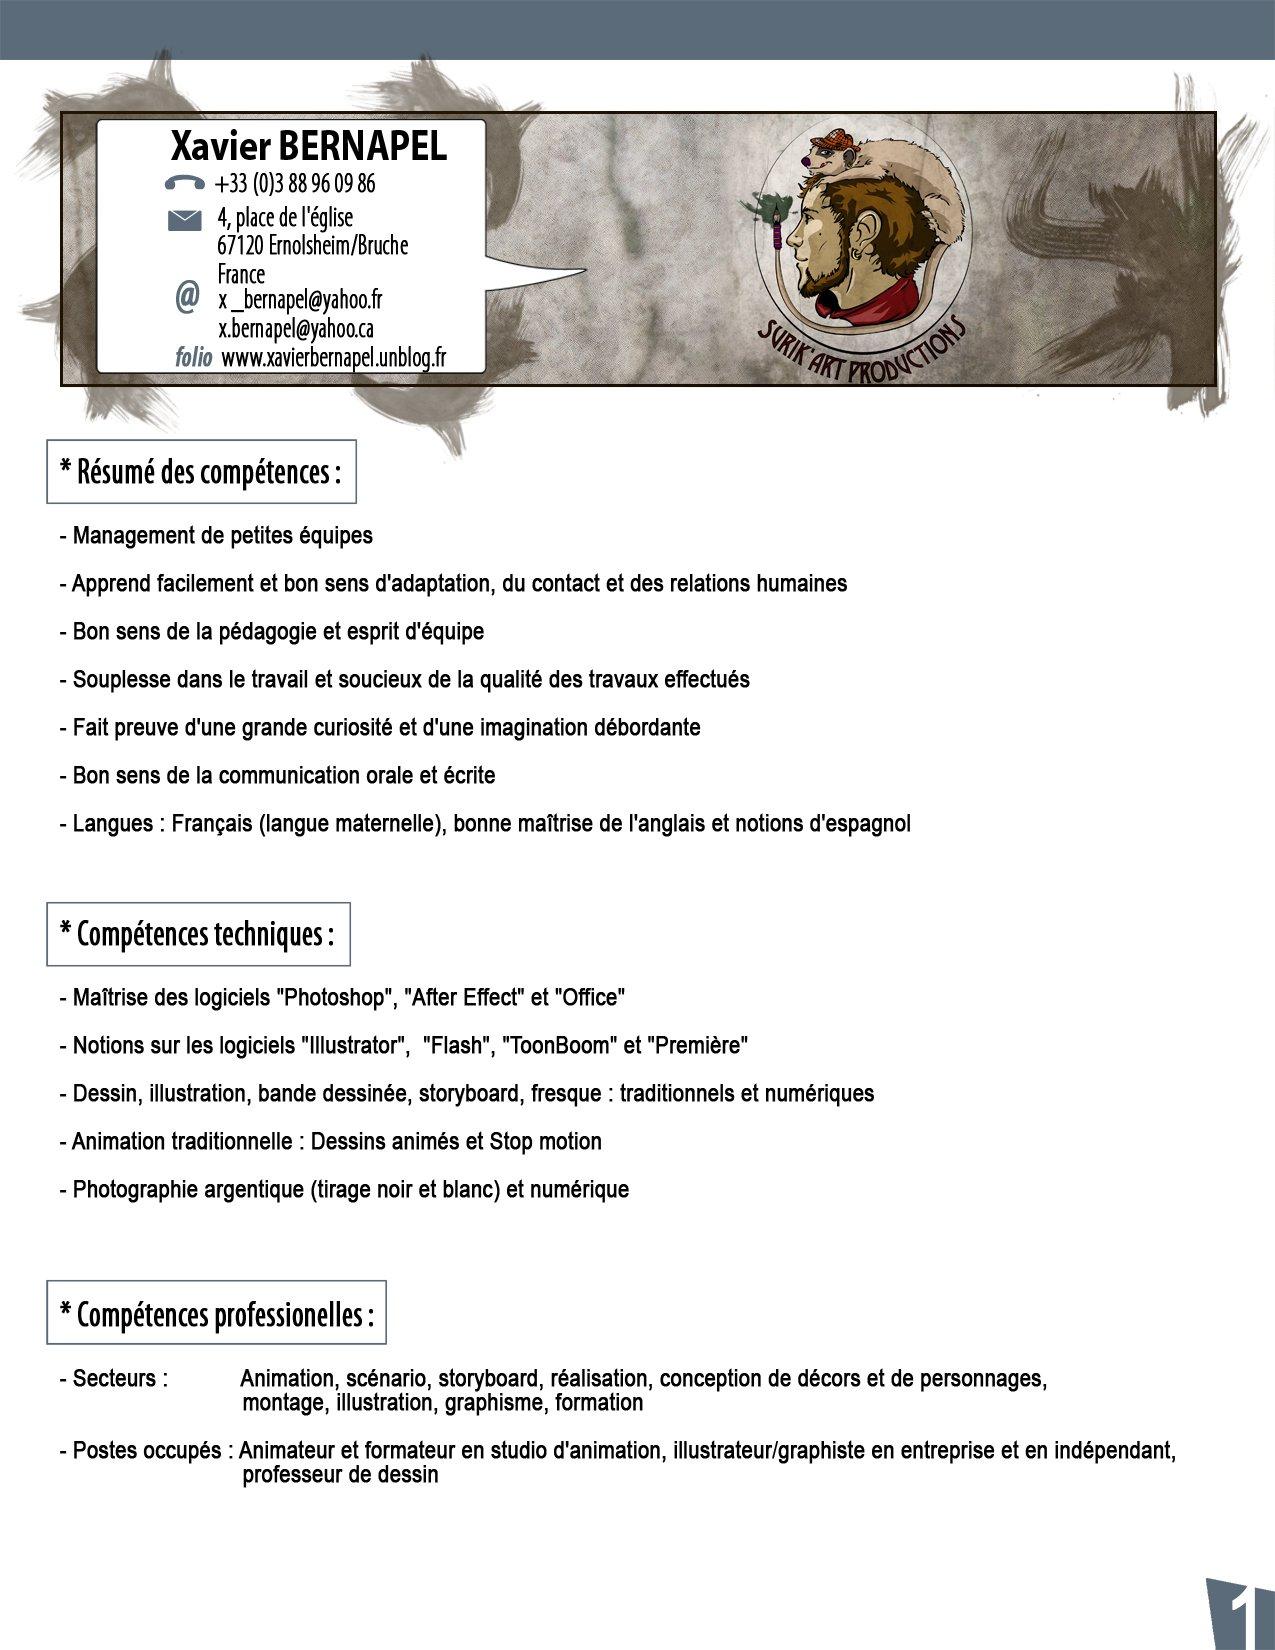 page1fr.jpg